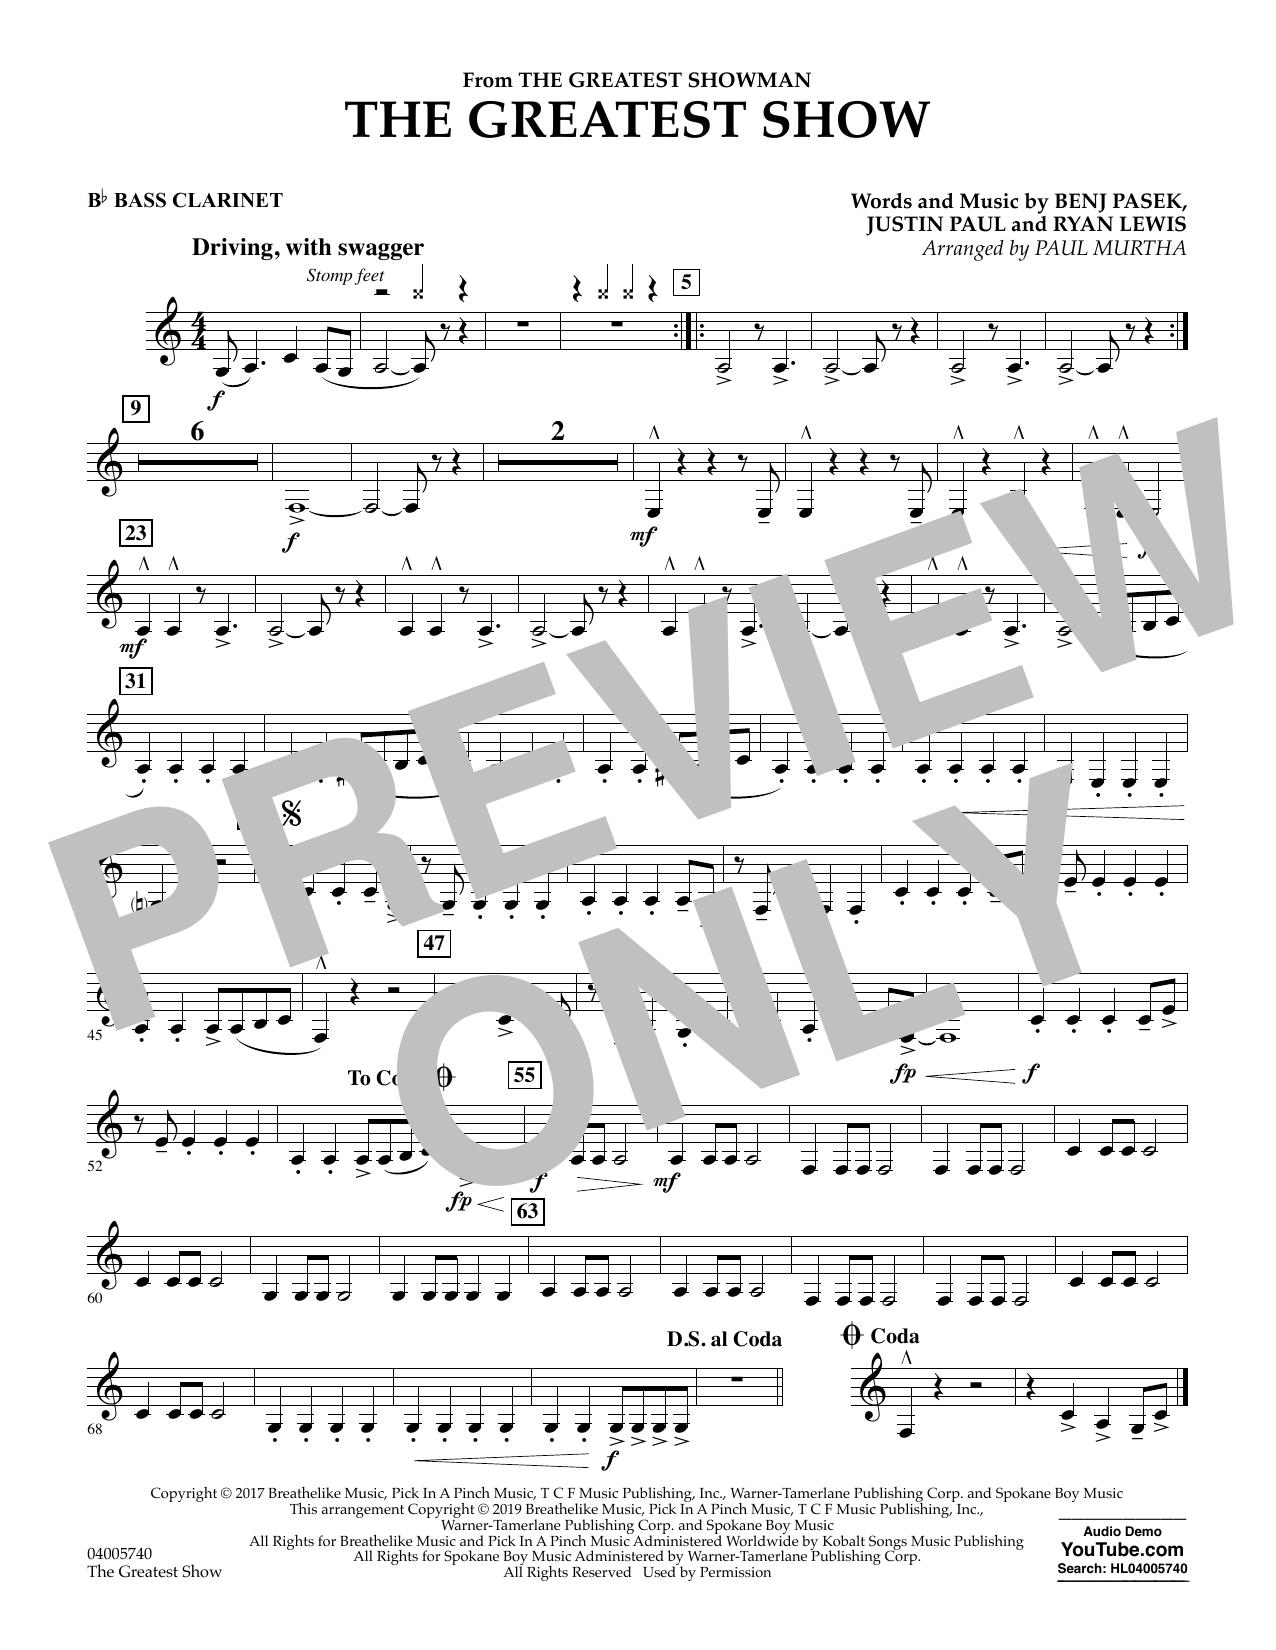 The Greatest Show  (arr. Paul Murtha) - Bb Bass Clarinet (Concert Band)